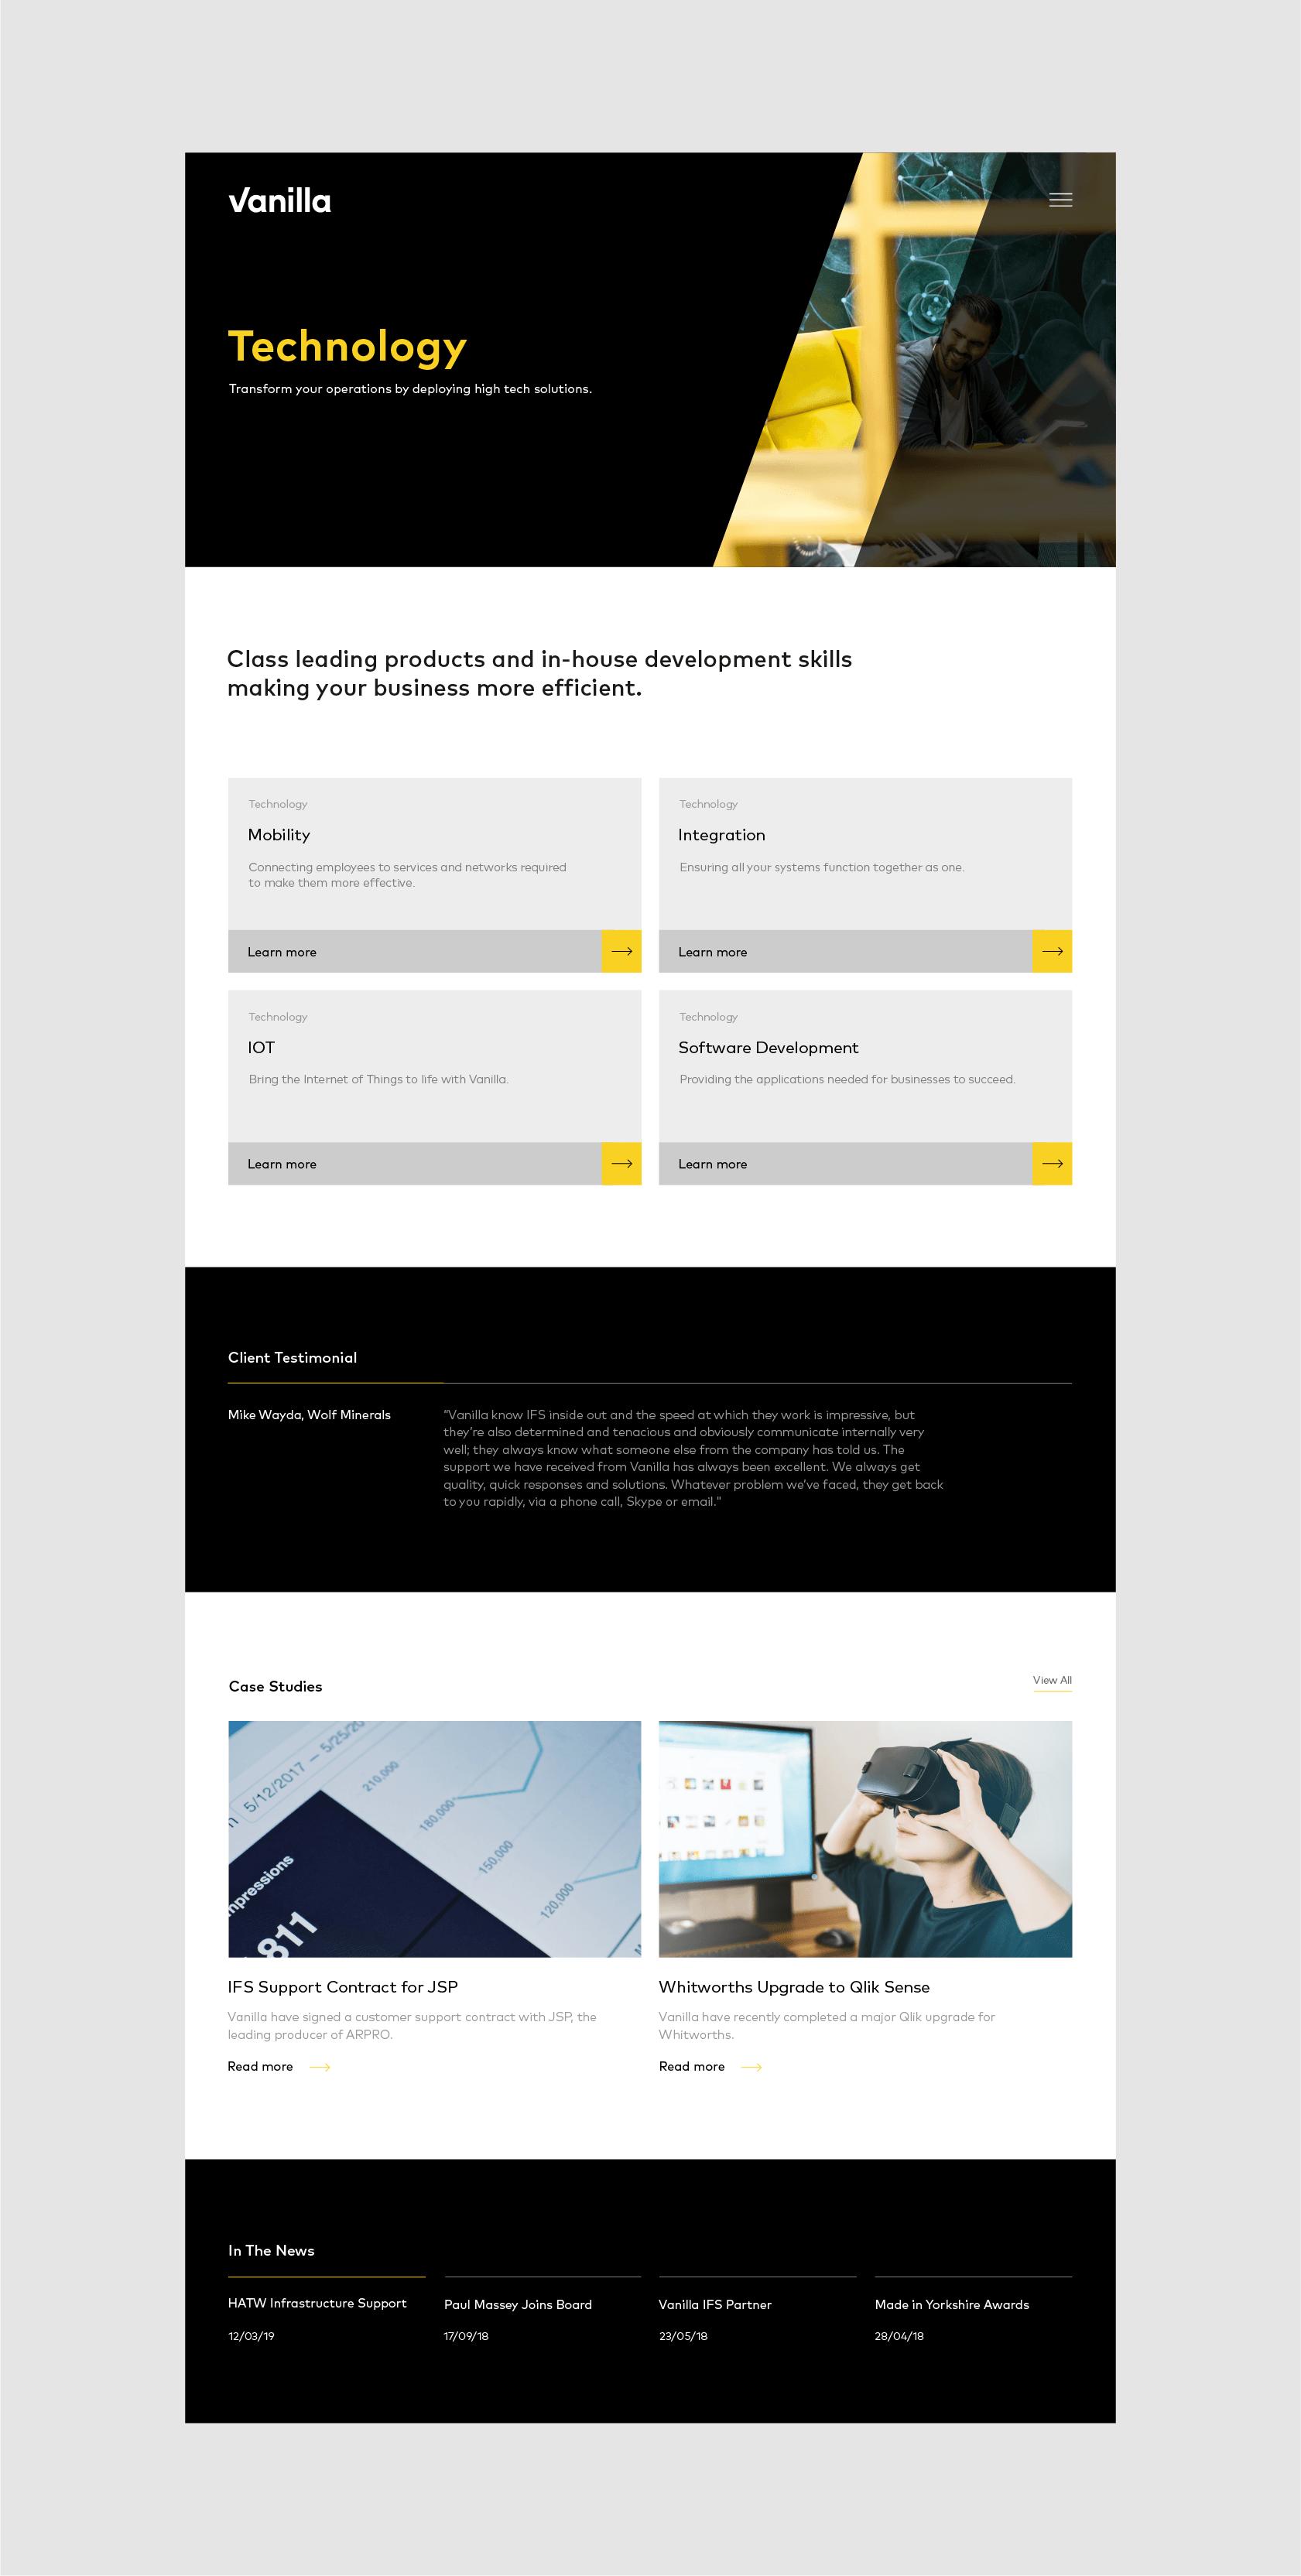 Website development for Vanilla